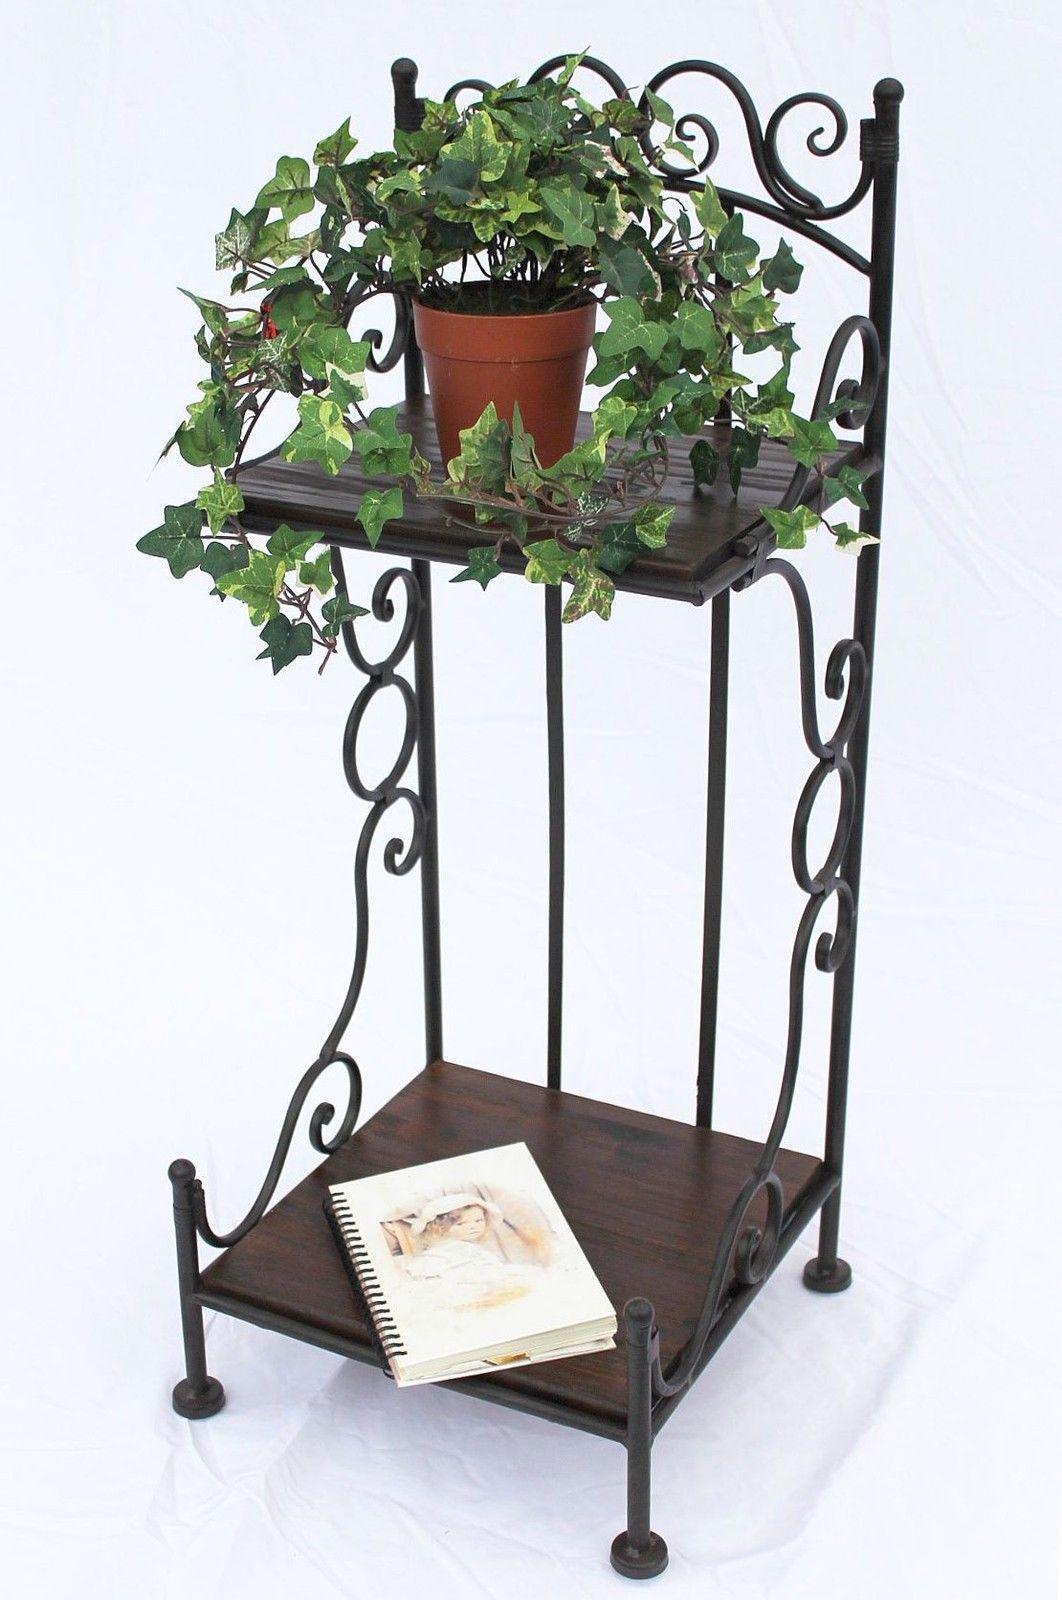 DanDiBo Shelf HX12585 Made from Metal and Wood 80 cm Book Shelf Bathroom Shelf Brown